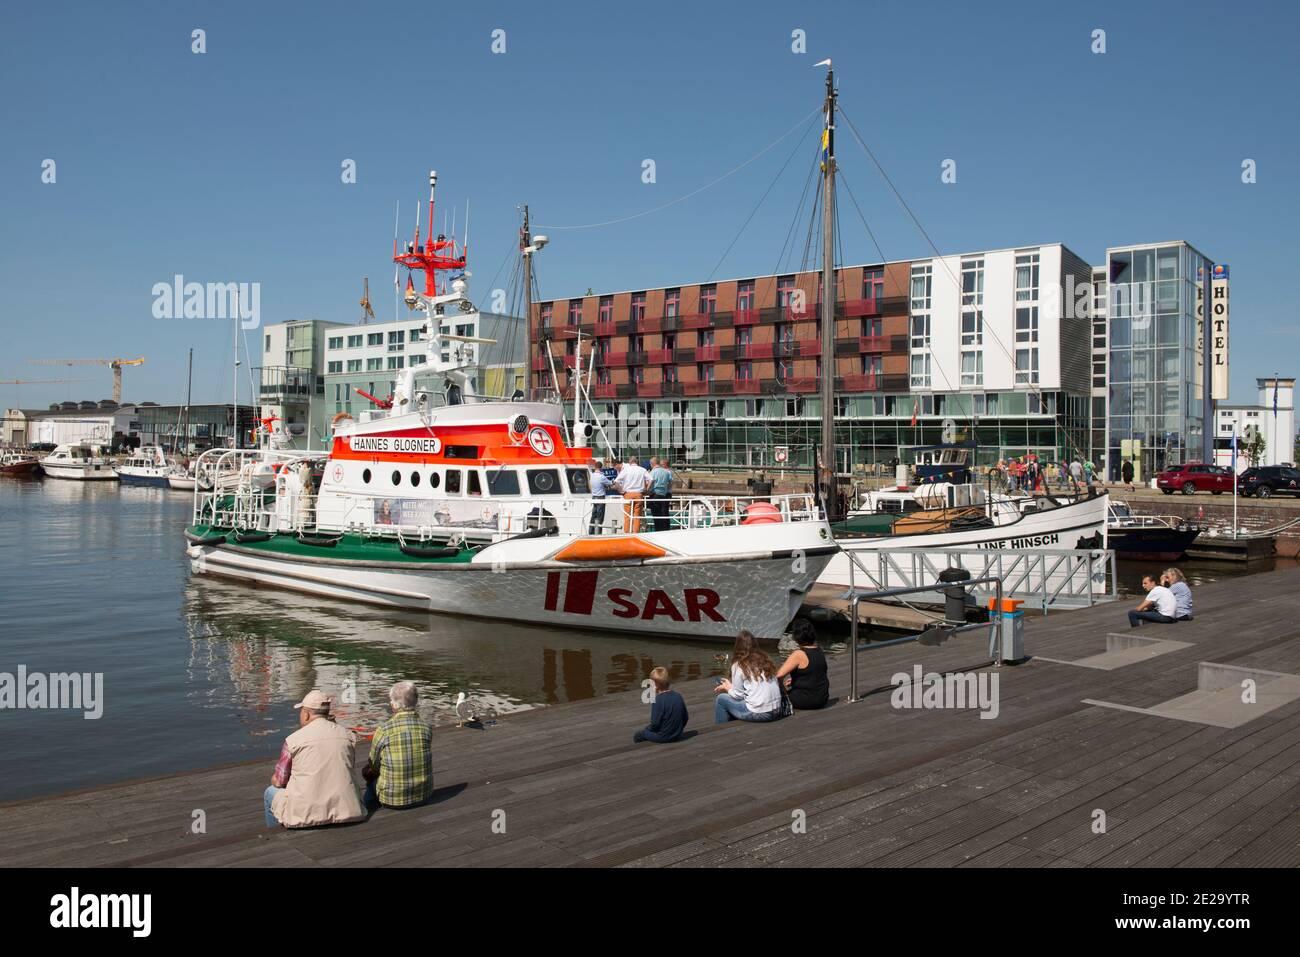 Germany, Bremerhaven: Hannes Glogner rescue cruiser, Line Hinsch museum ship in the Schaufenster Fischereihafen, the old Bremerhaven fishing harbour. Stock Photo